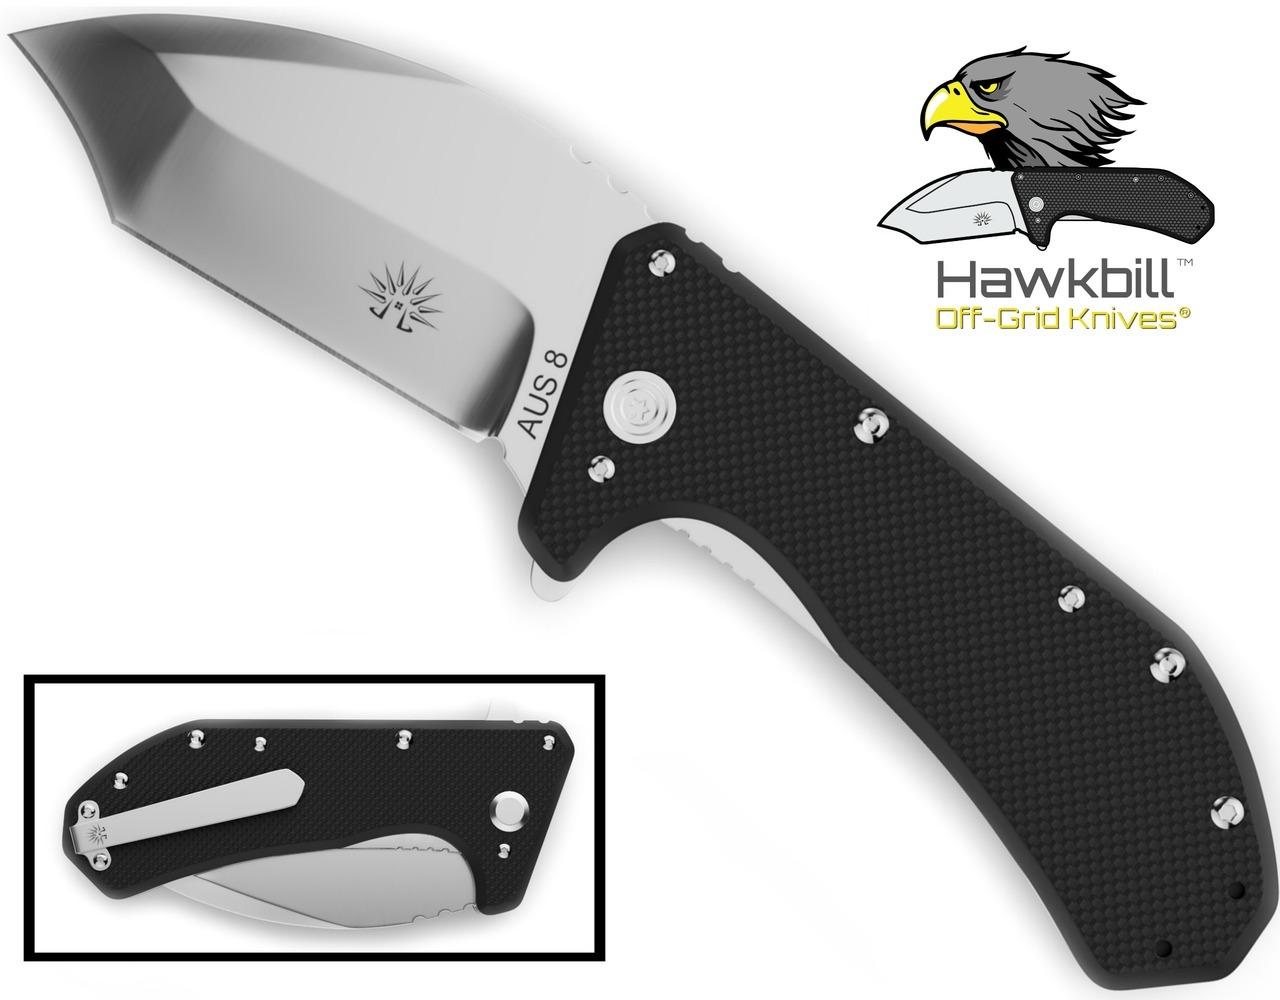 folding-knives-for-sale-online